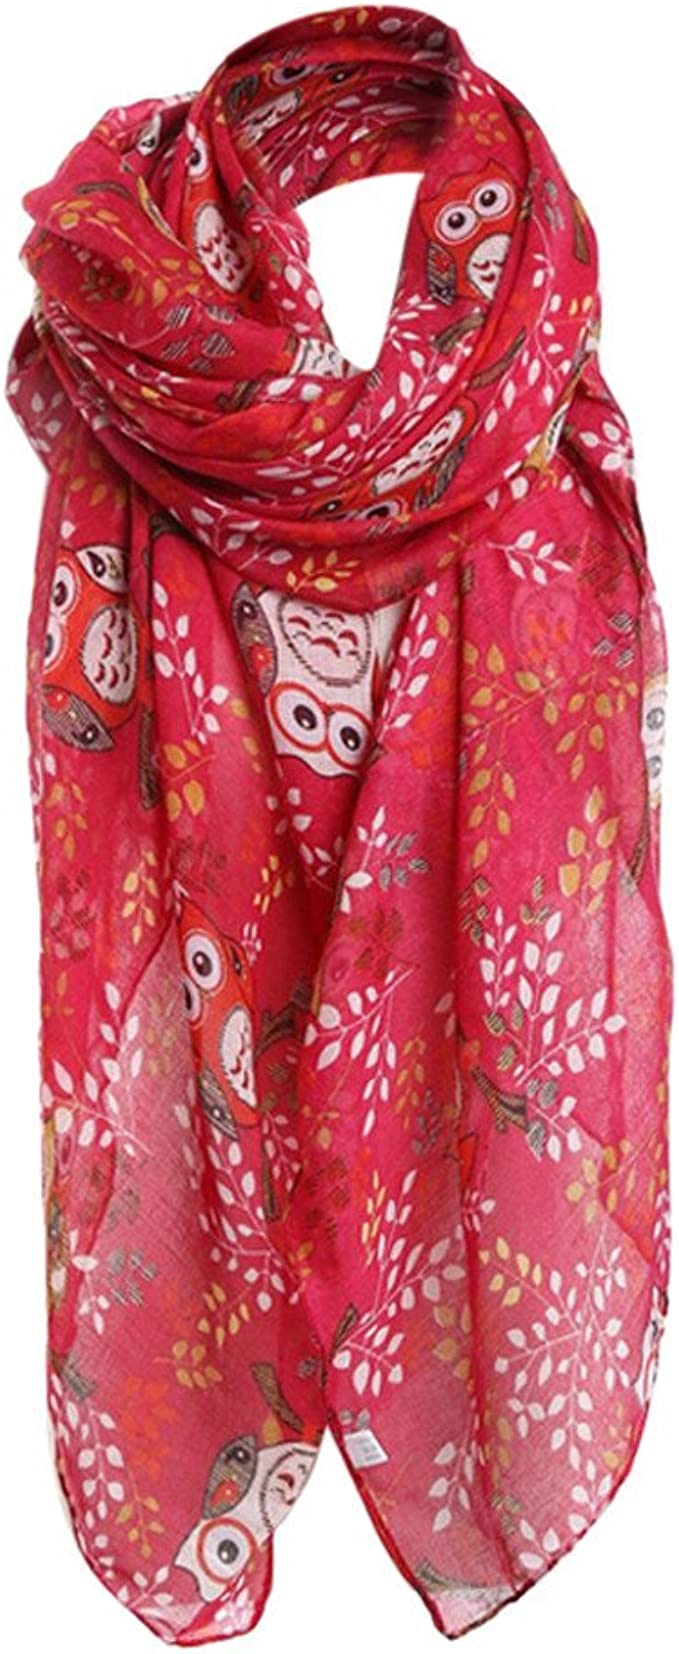 Uribake Women S Shawl Owl Print Pattern Soft Lace Long Scarf Warm Wrap Autumn Red At Amazon Women S Clothing Store